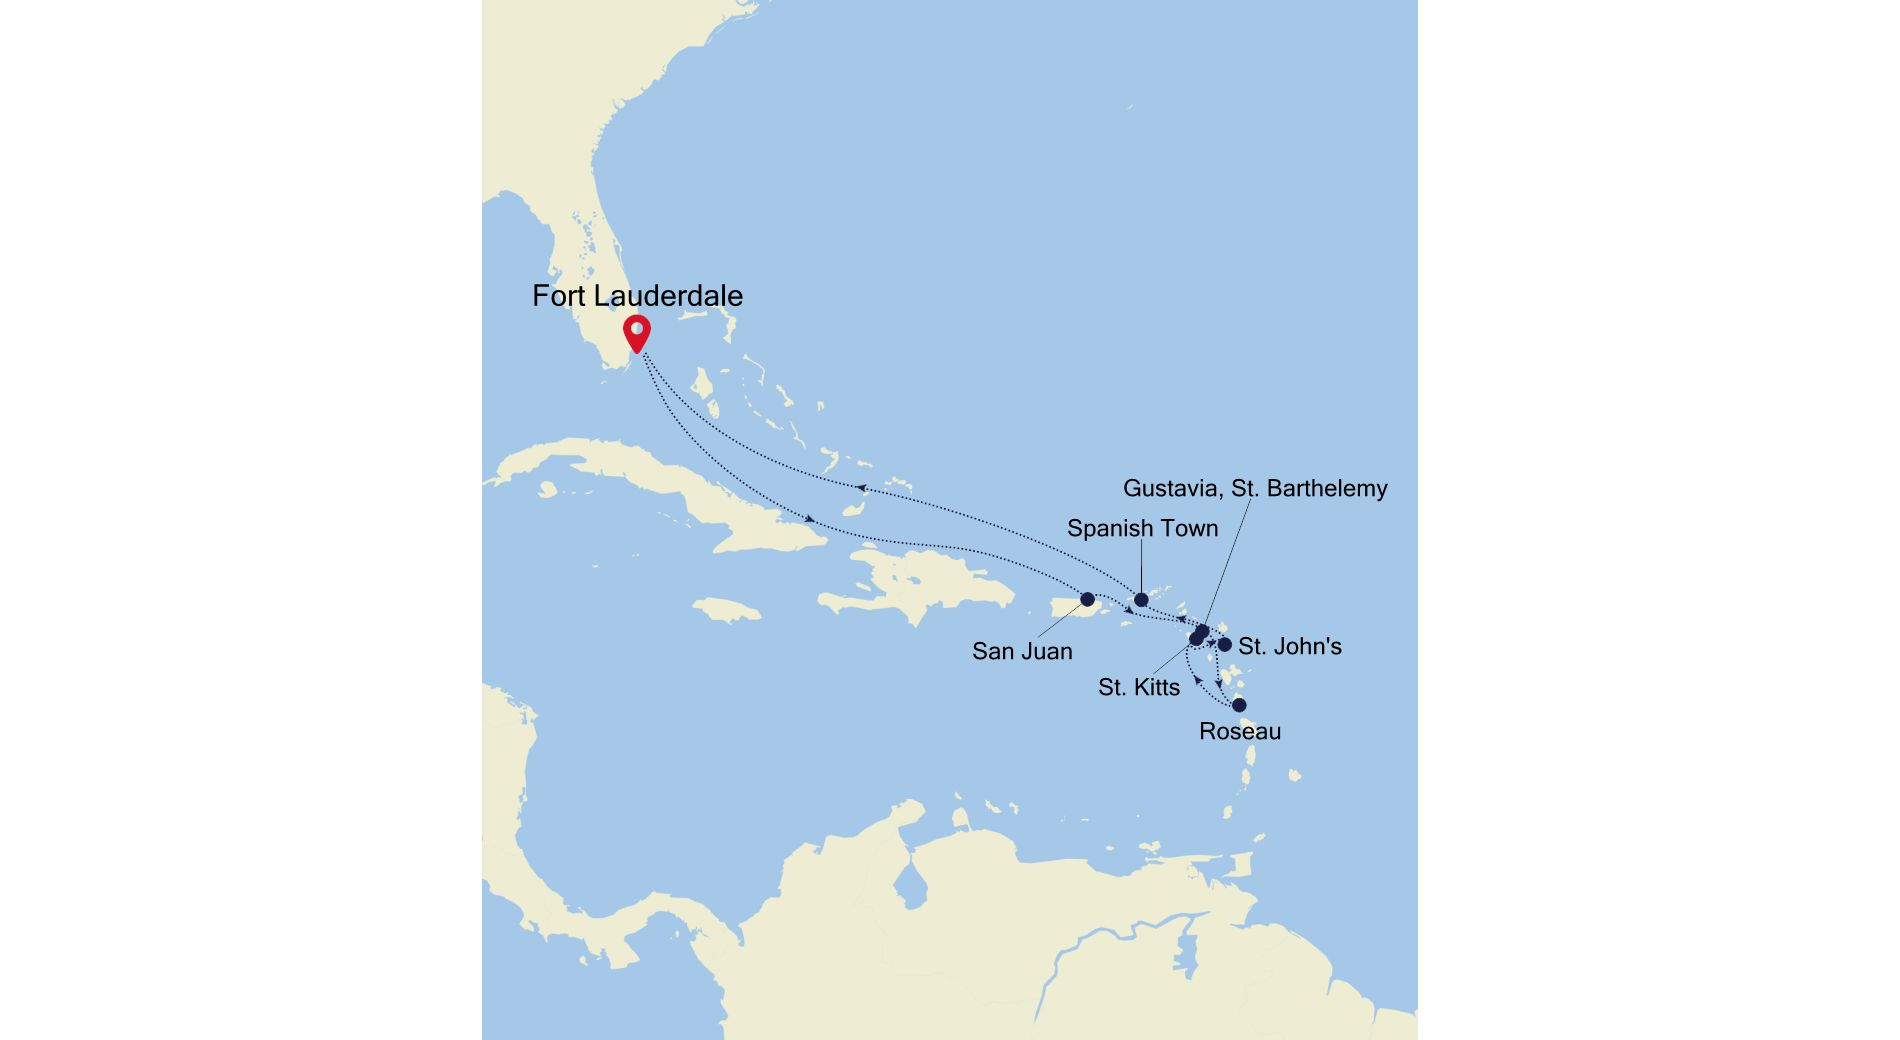 SL220114011 - Fort Lauderdale a Fort Lauderdale